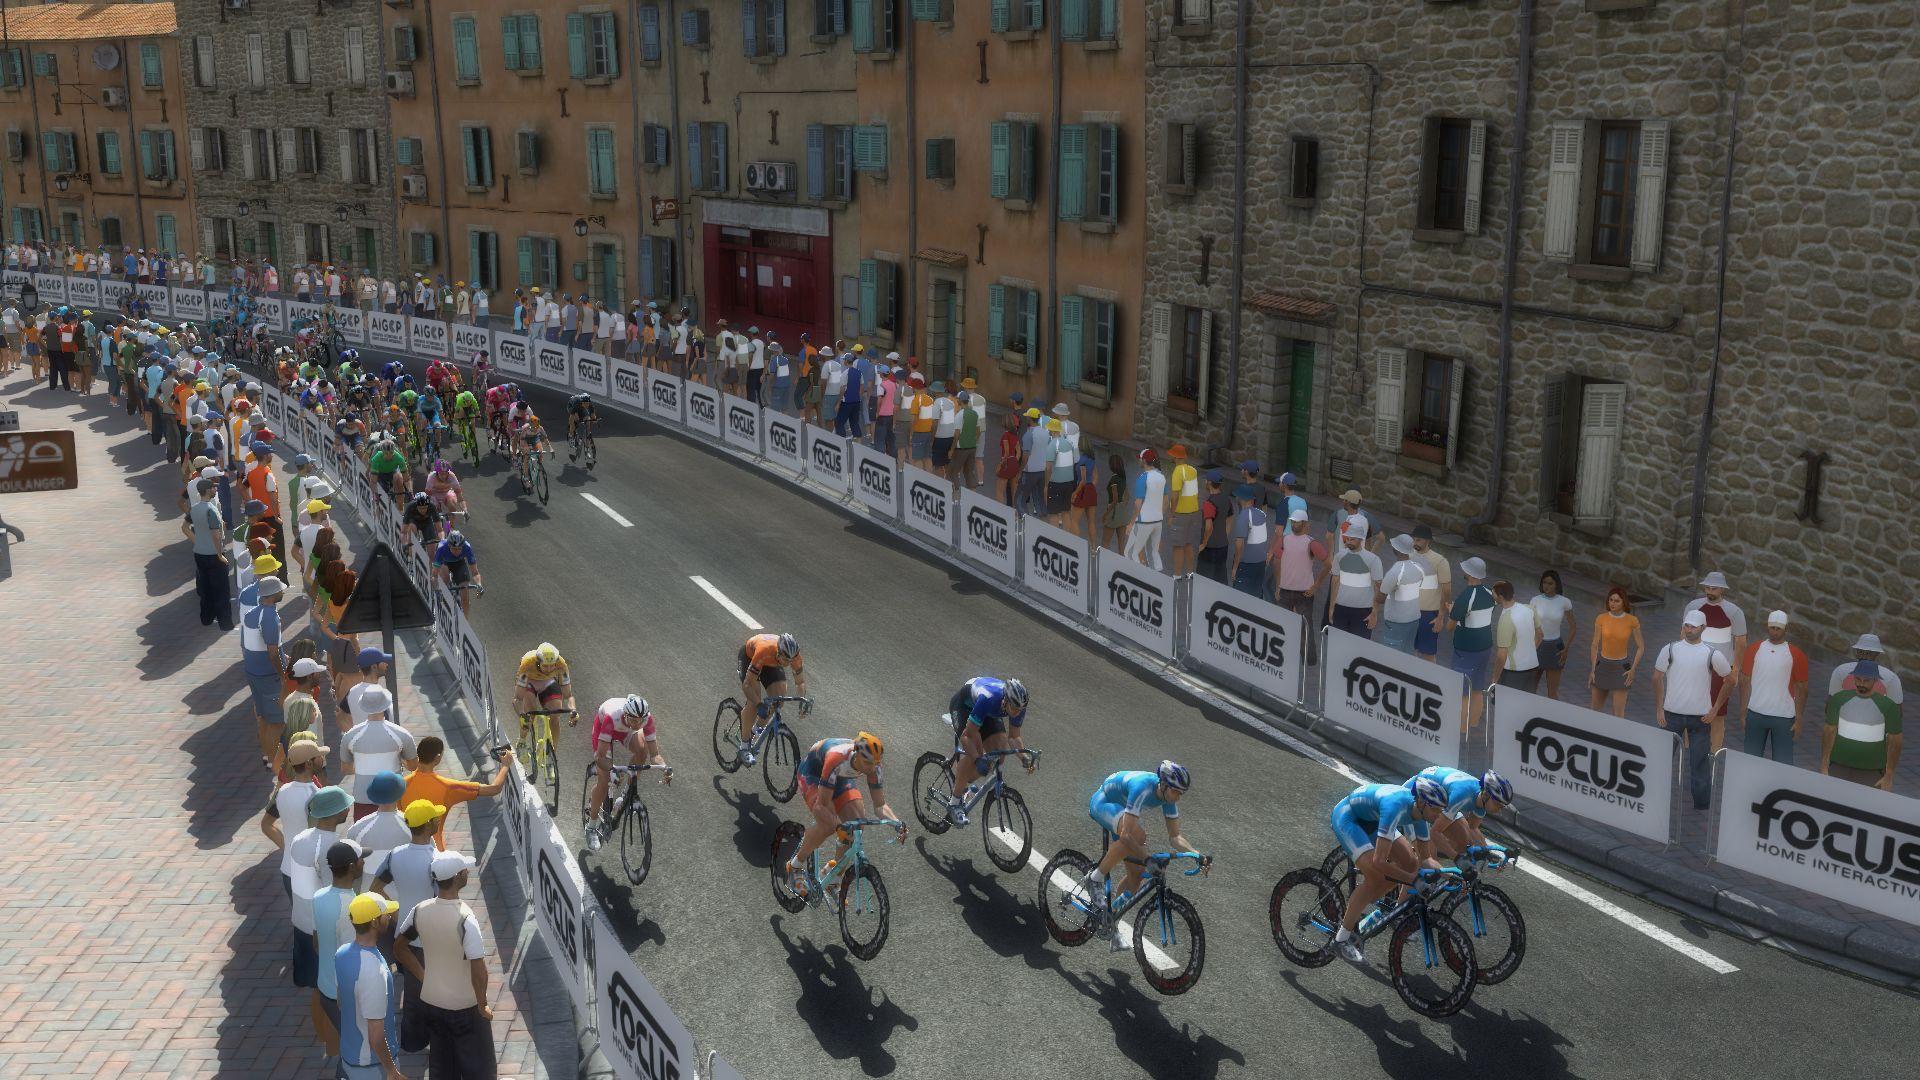 pcmdaily.com/images/mg/2019/Races/PT/Tirreno/mg19_ta_s07_20.jpg